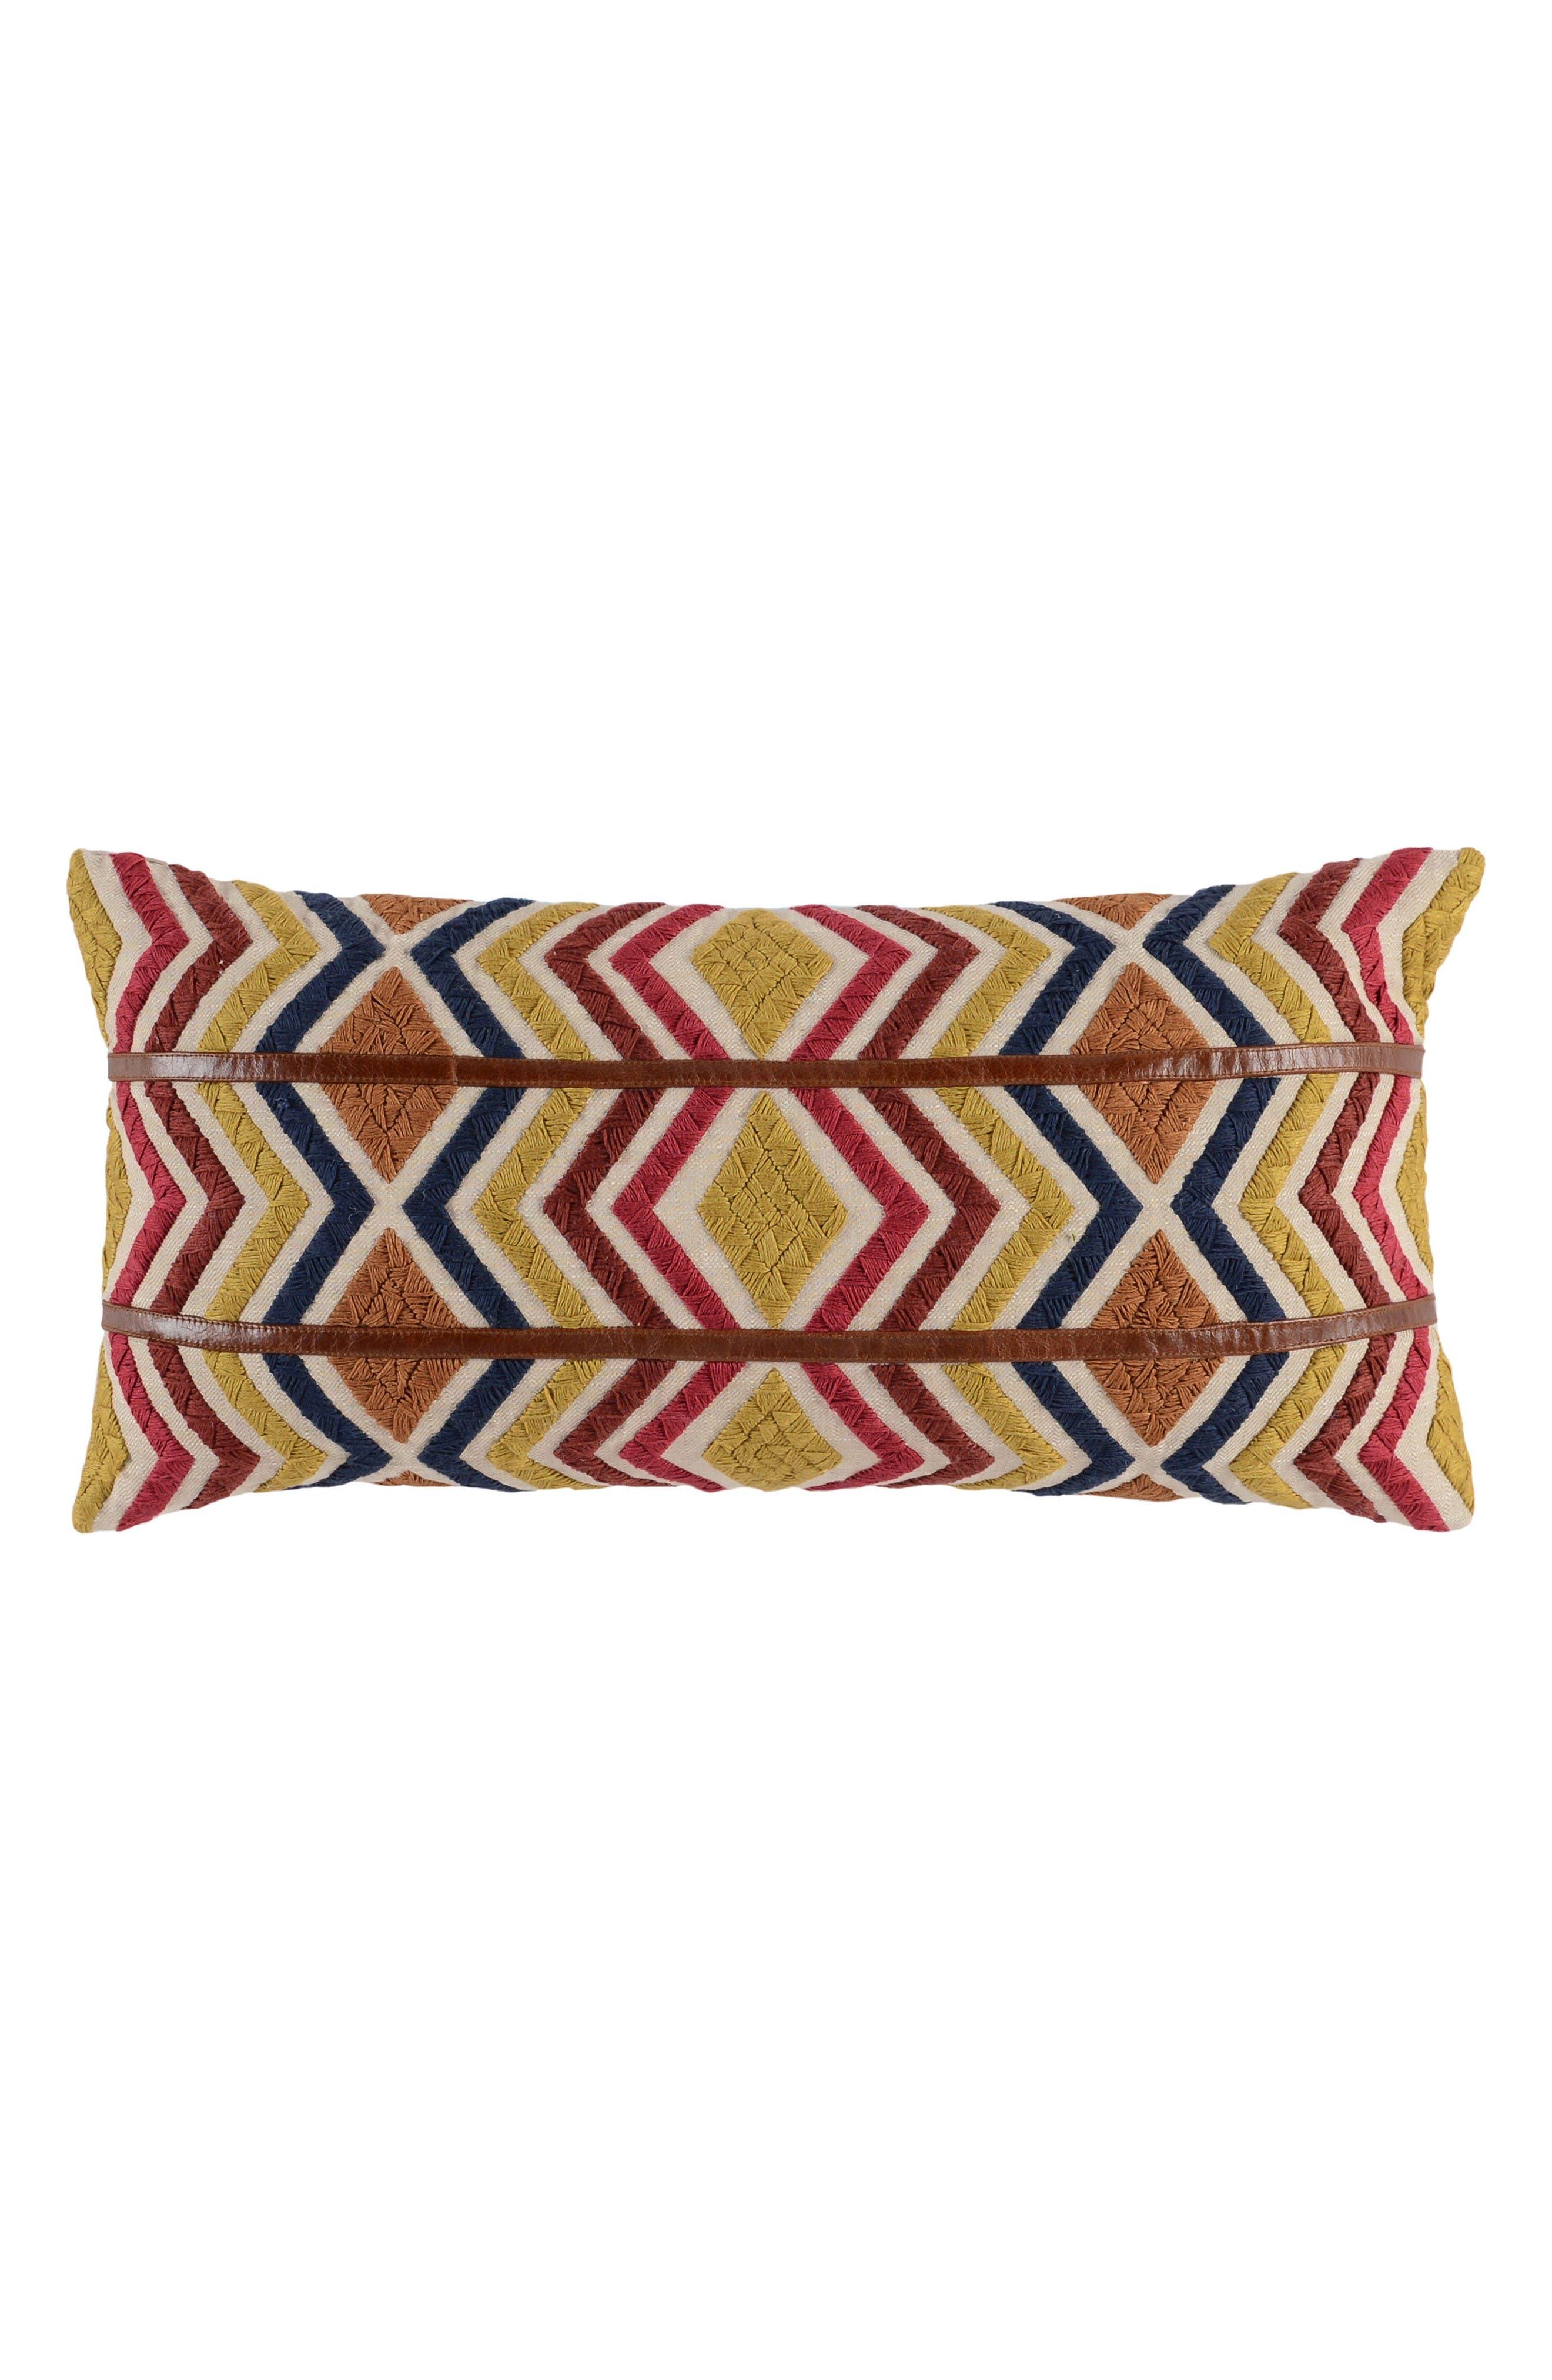 Main Image - Villa Home Collection Alta Accent Pillow